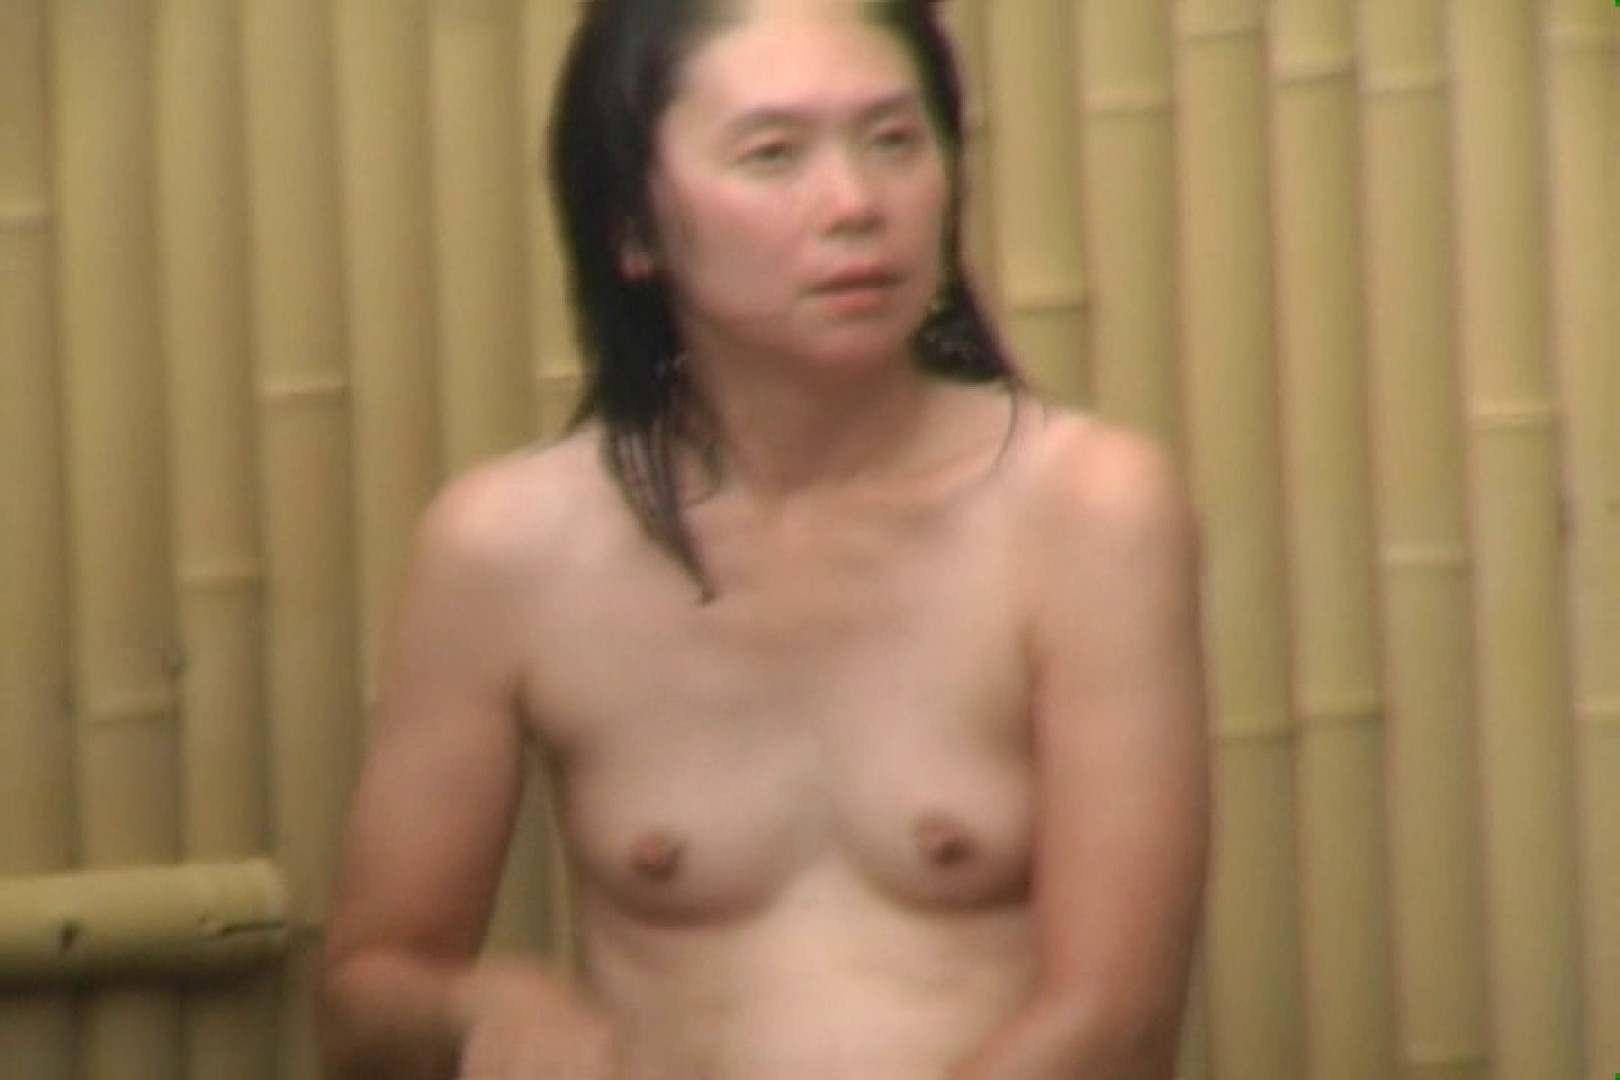 Aquaな露天風呂Vol.619 エッチな盗撮 ワレメ無修正動画無料 107pic 23